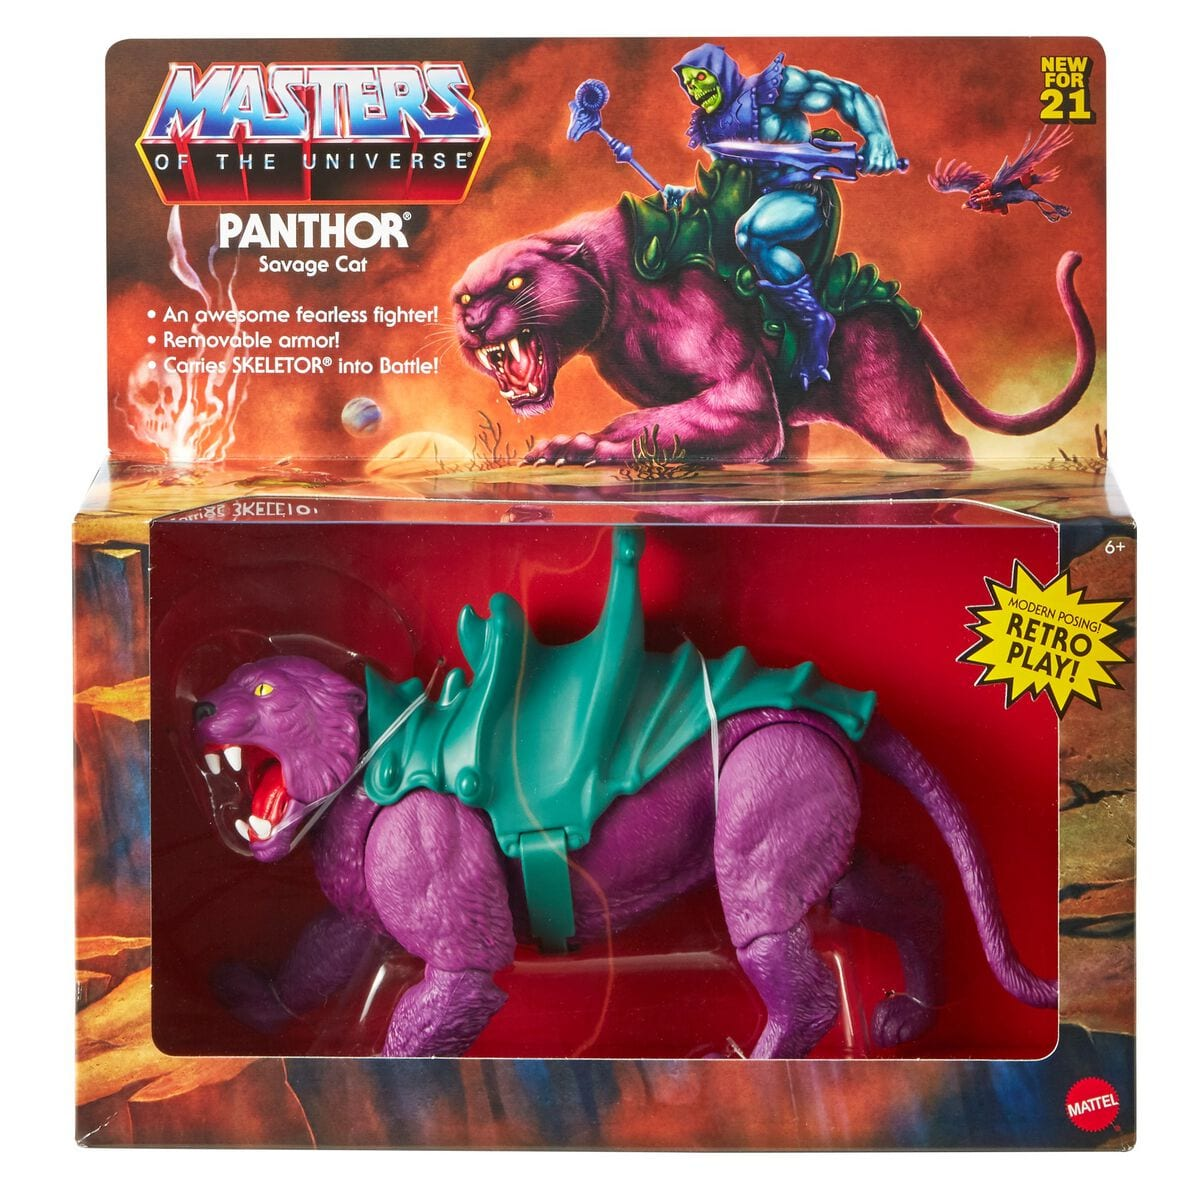 Mattel Master of the Univer GVN49 Panthor Spielfigur